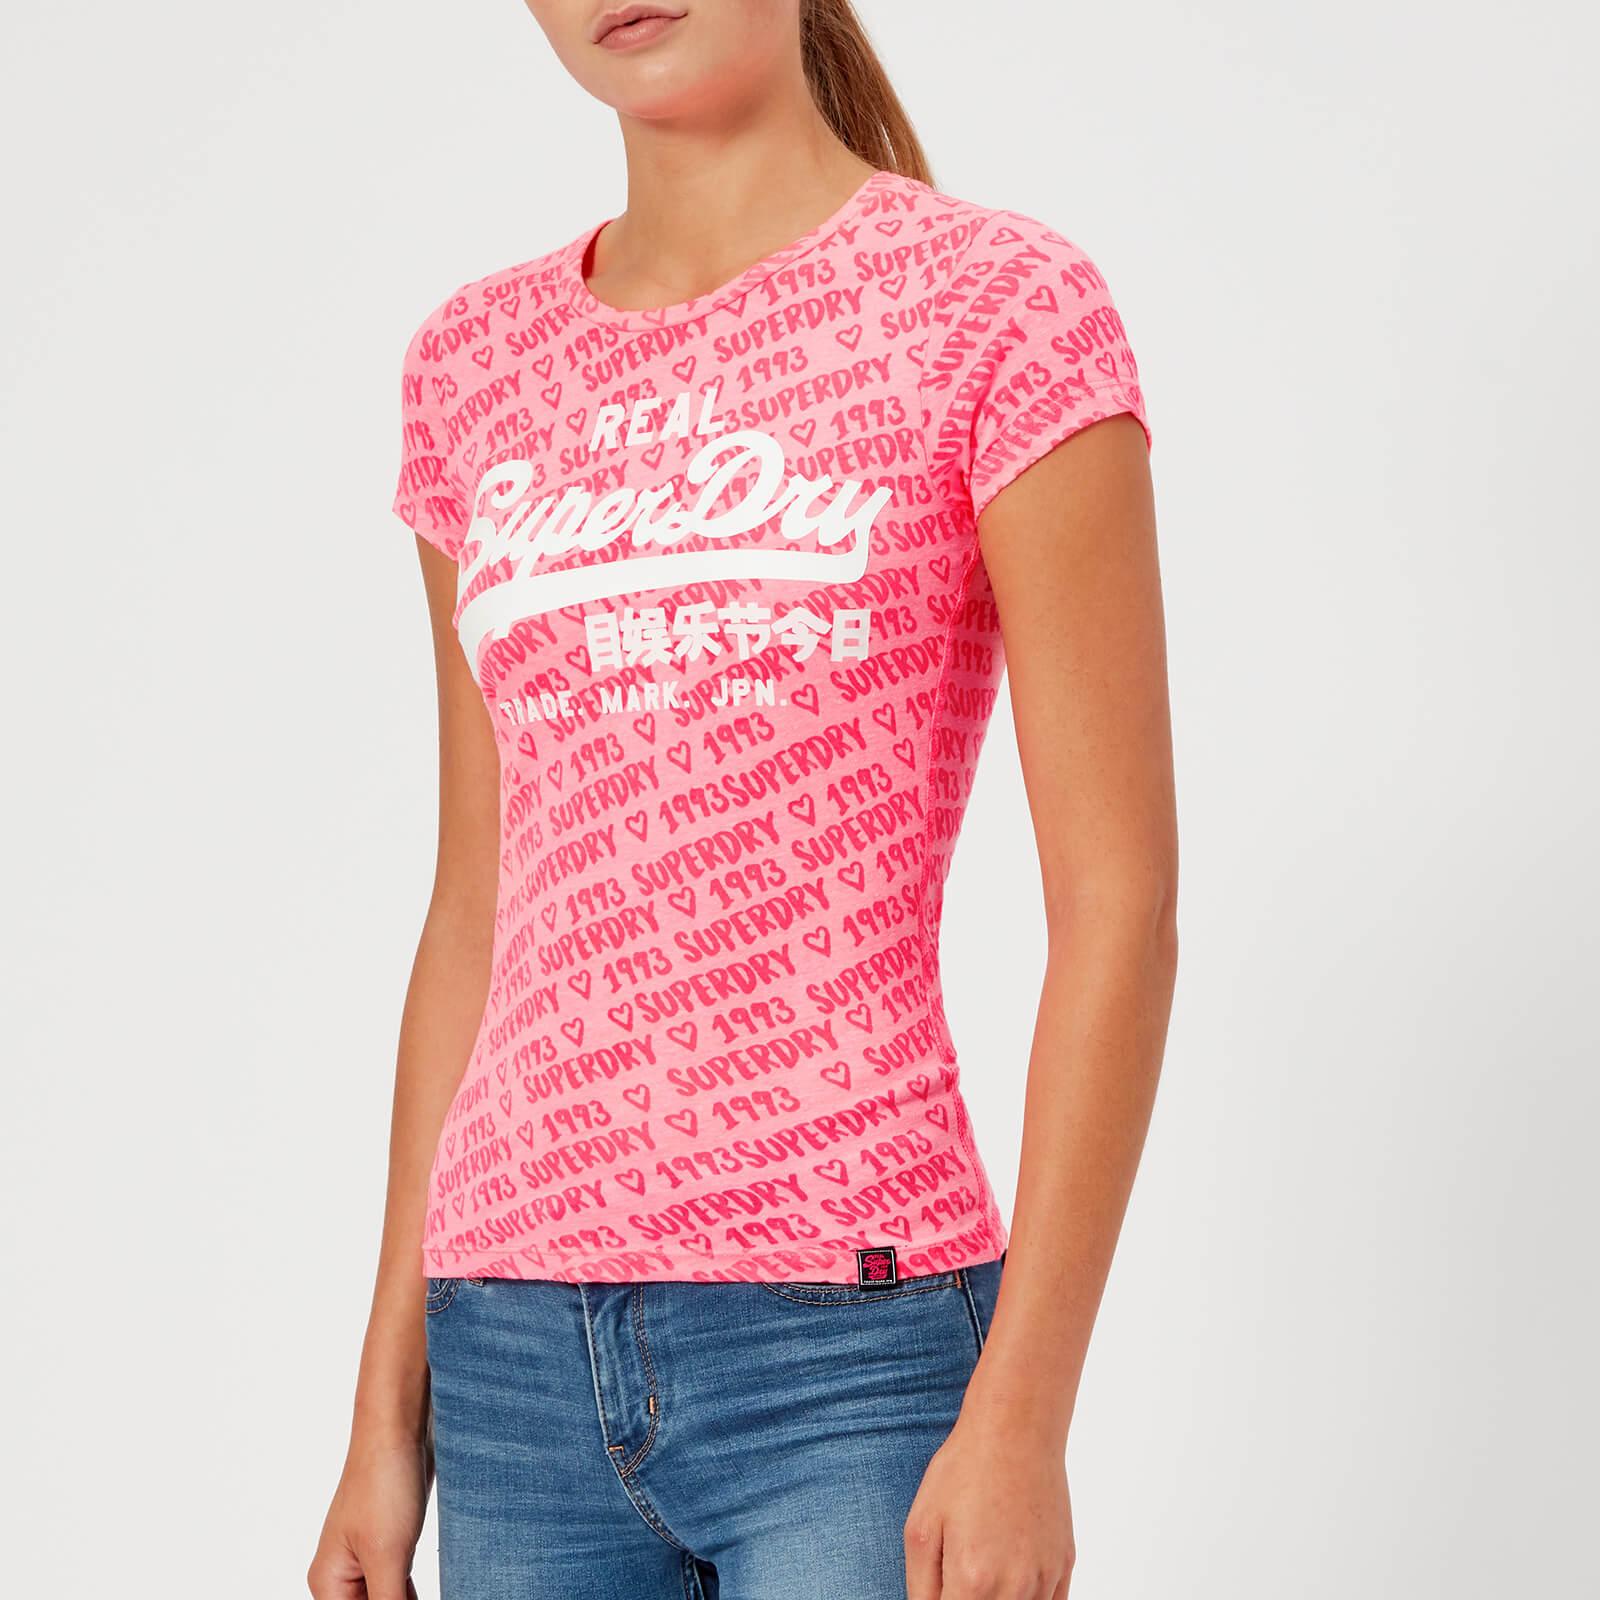 43588ed8 Superdry Women's Vintage Logo Aop Burnout Entry T-Shirt - Fluro Pink Womens  Clothing | TheHut.com